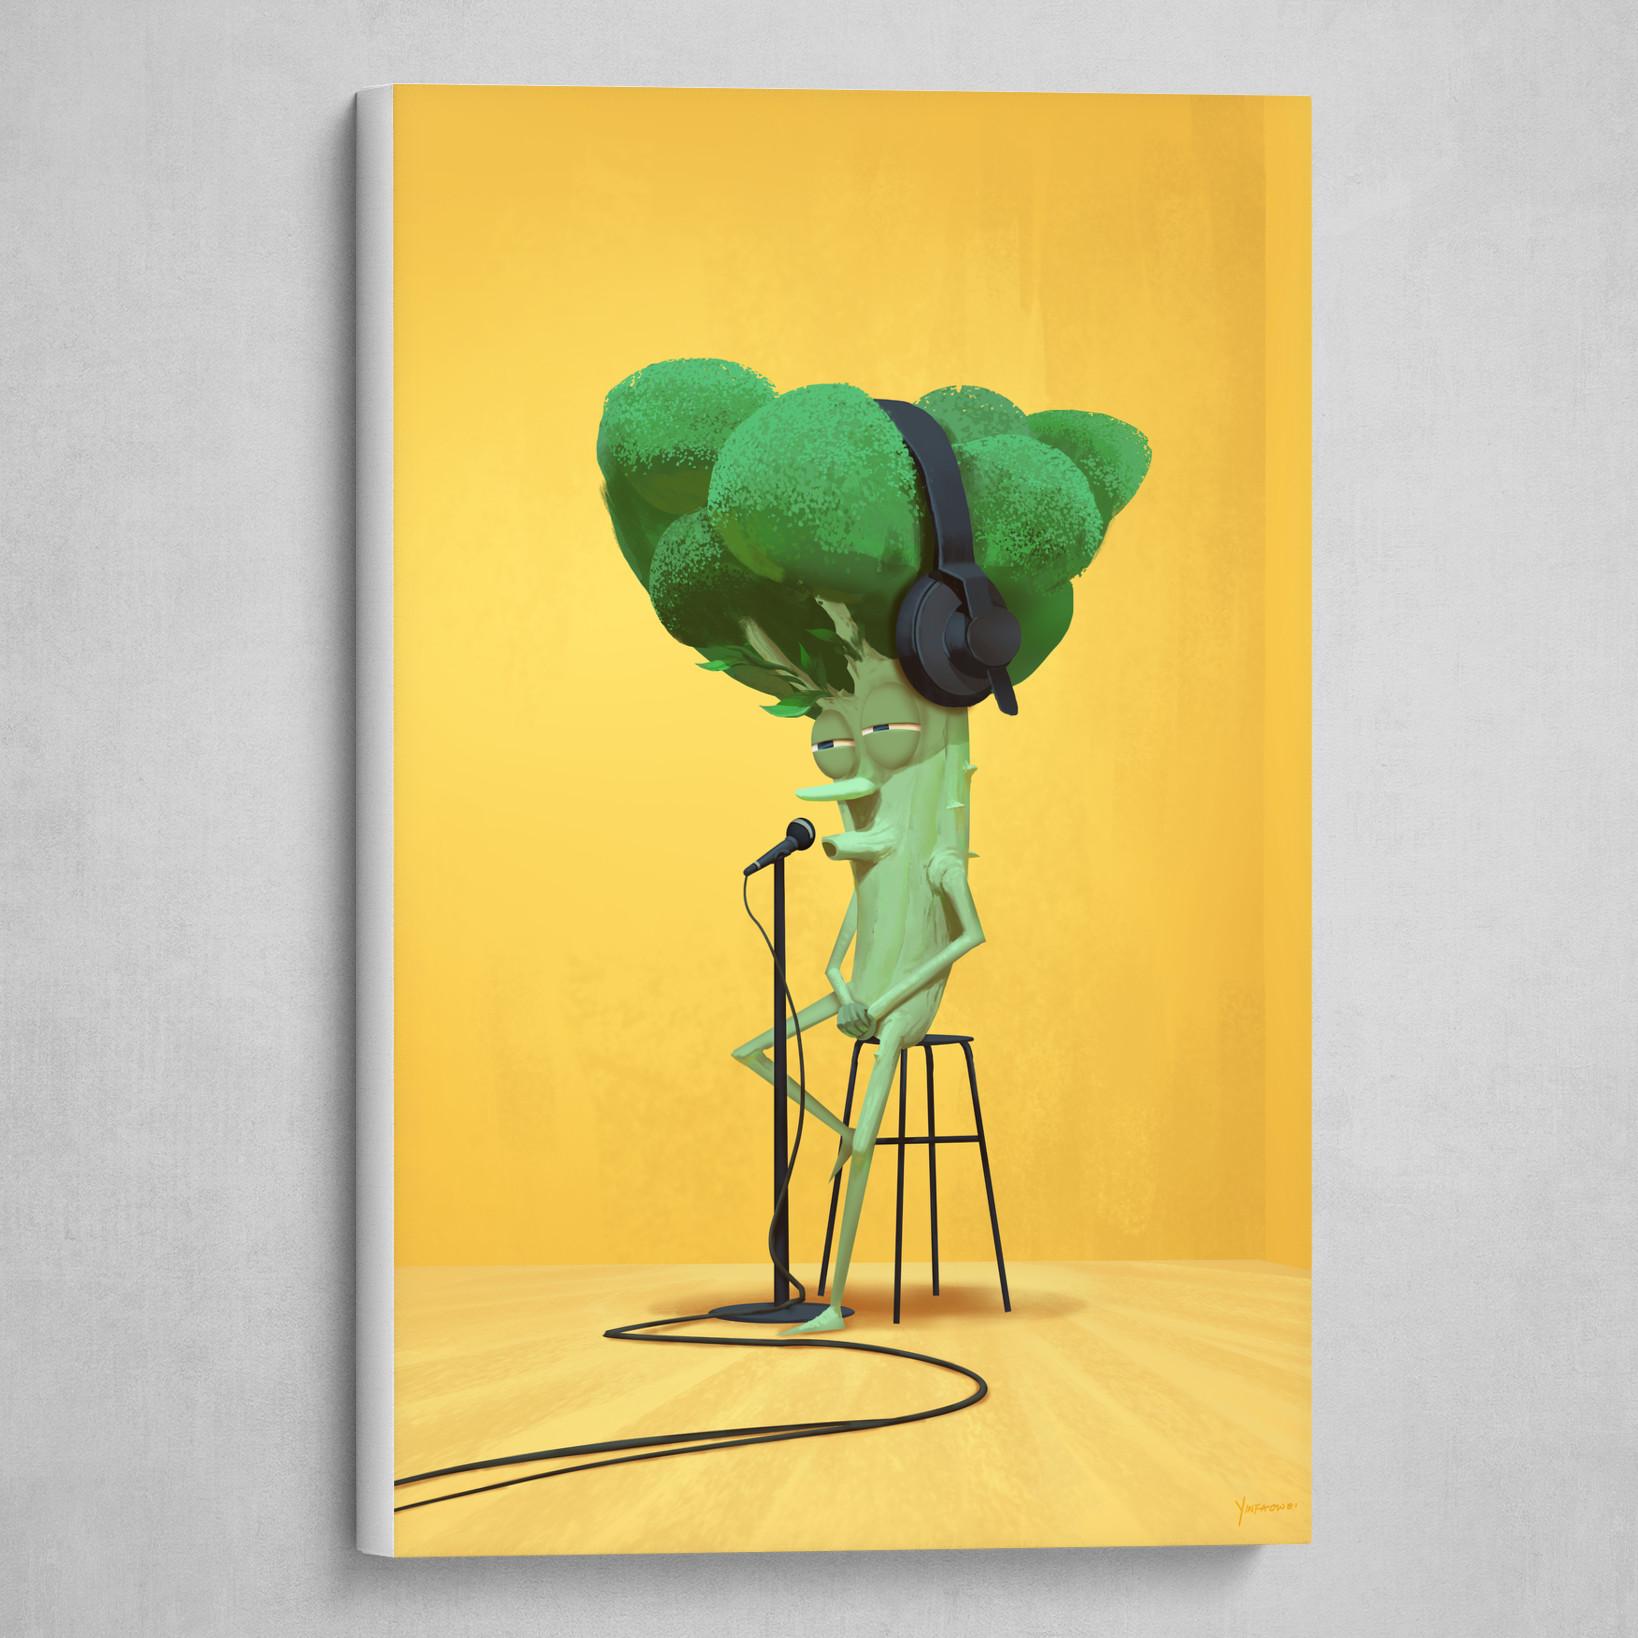 Broccoli Sings